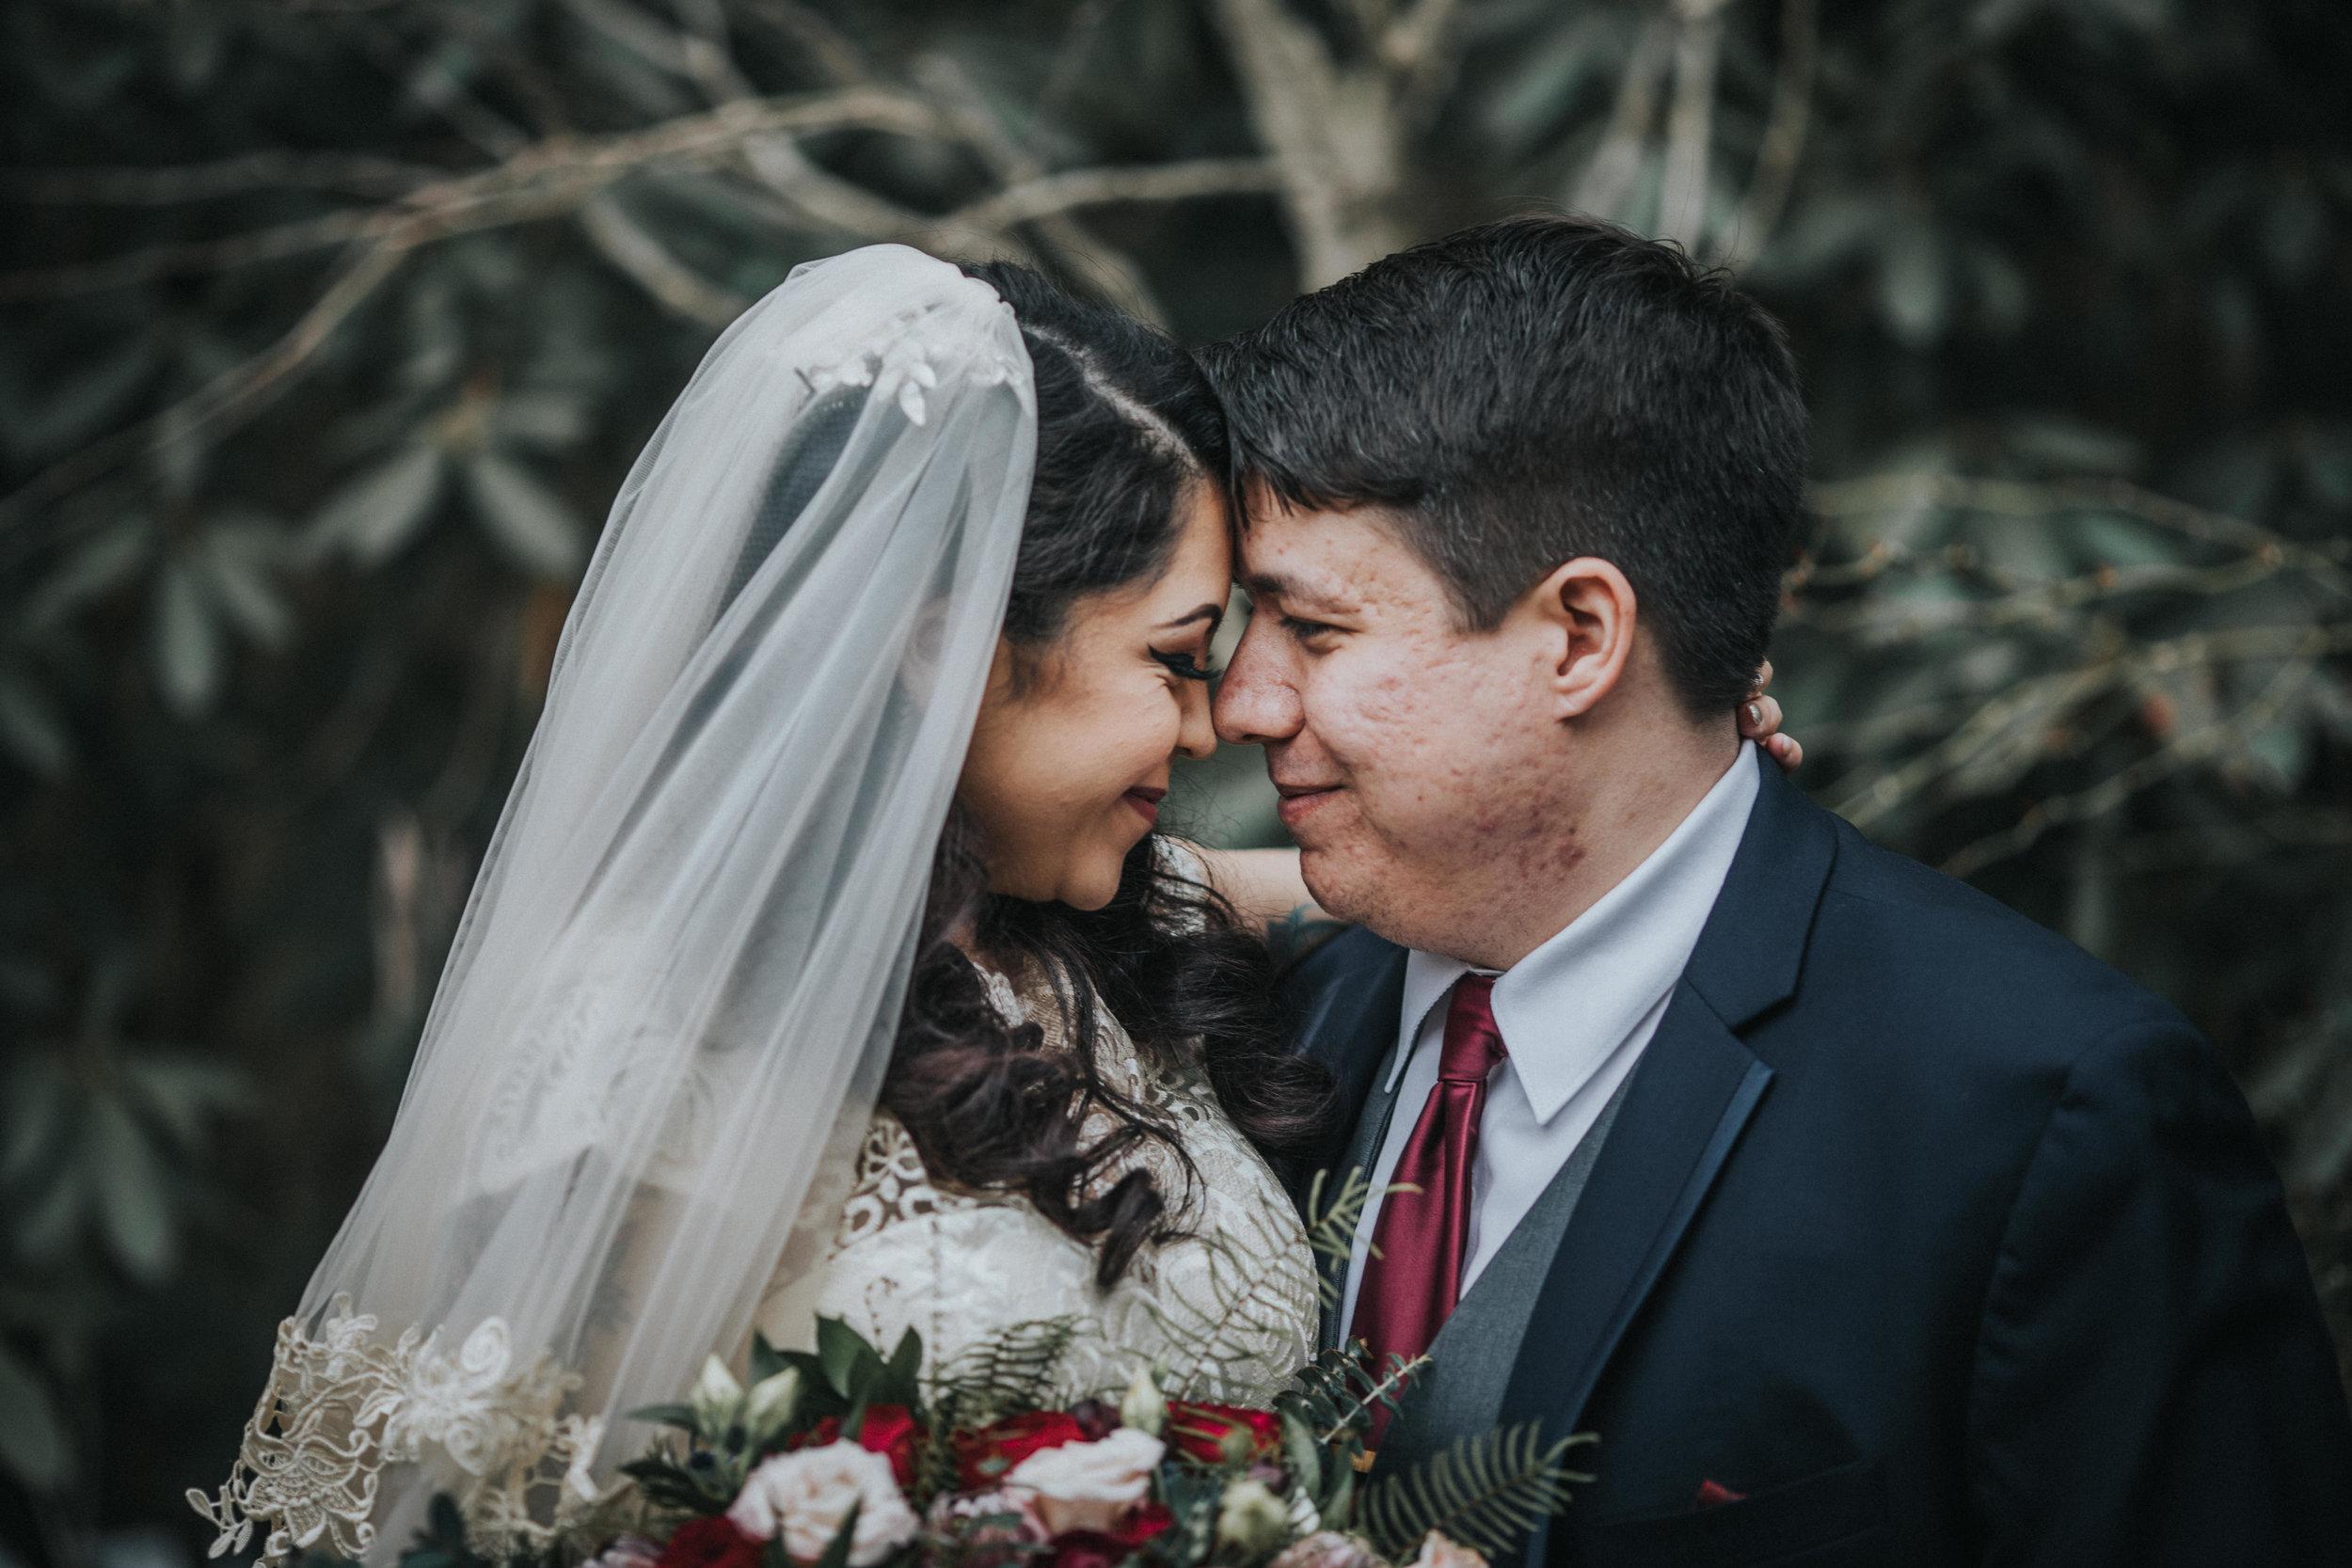 New-Jersey-Wedding-Photographer-ReceptionCenter-Valeria&Mike-First-Look-Bride&Groom (28 of 69).jpg